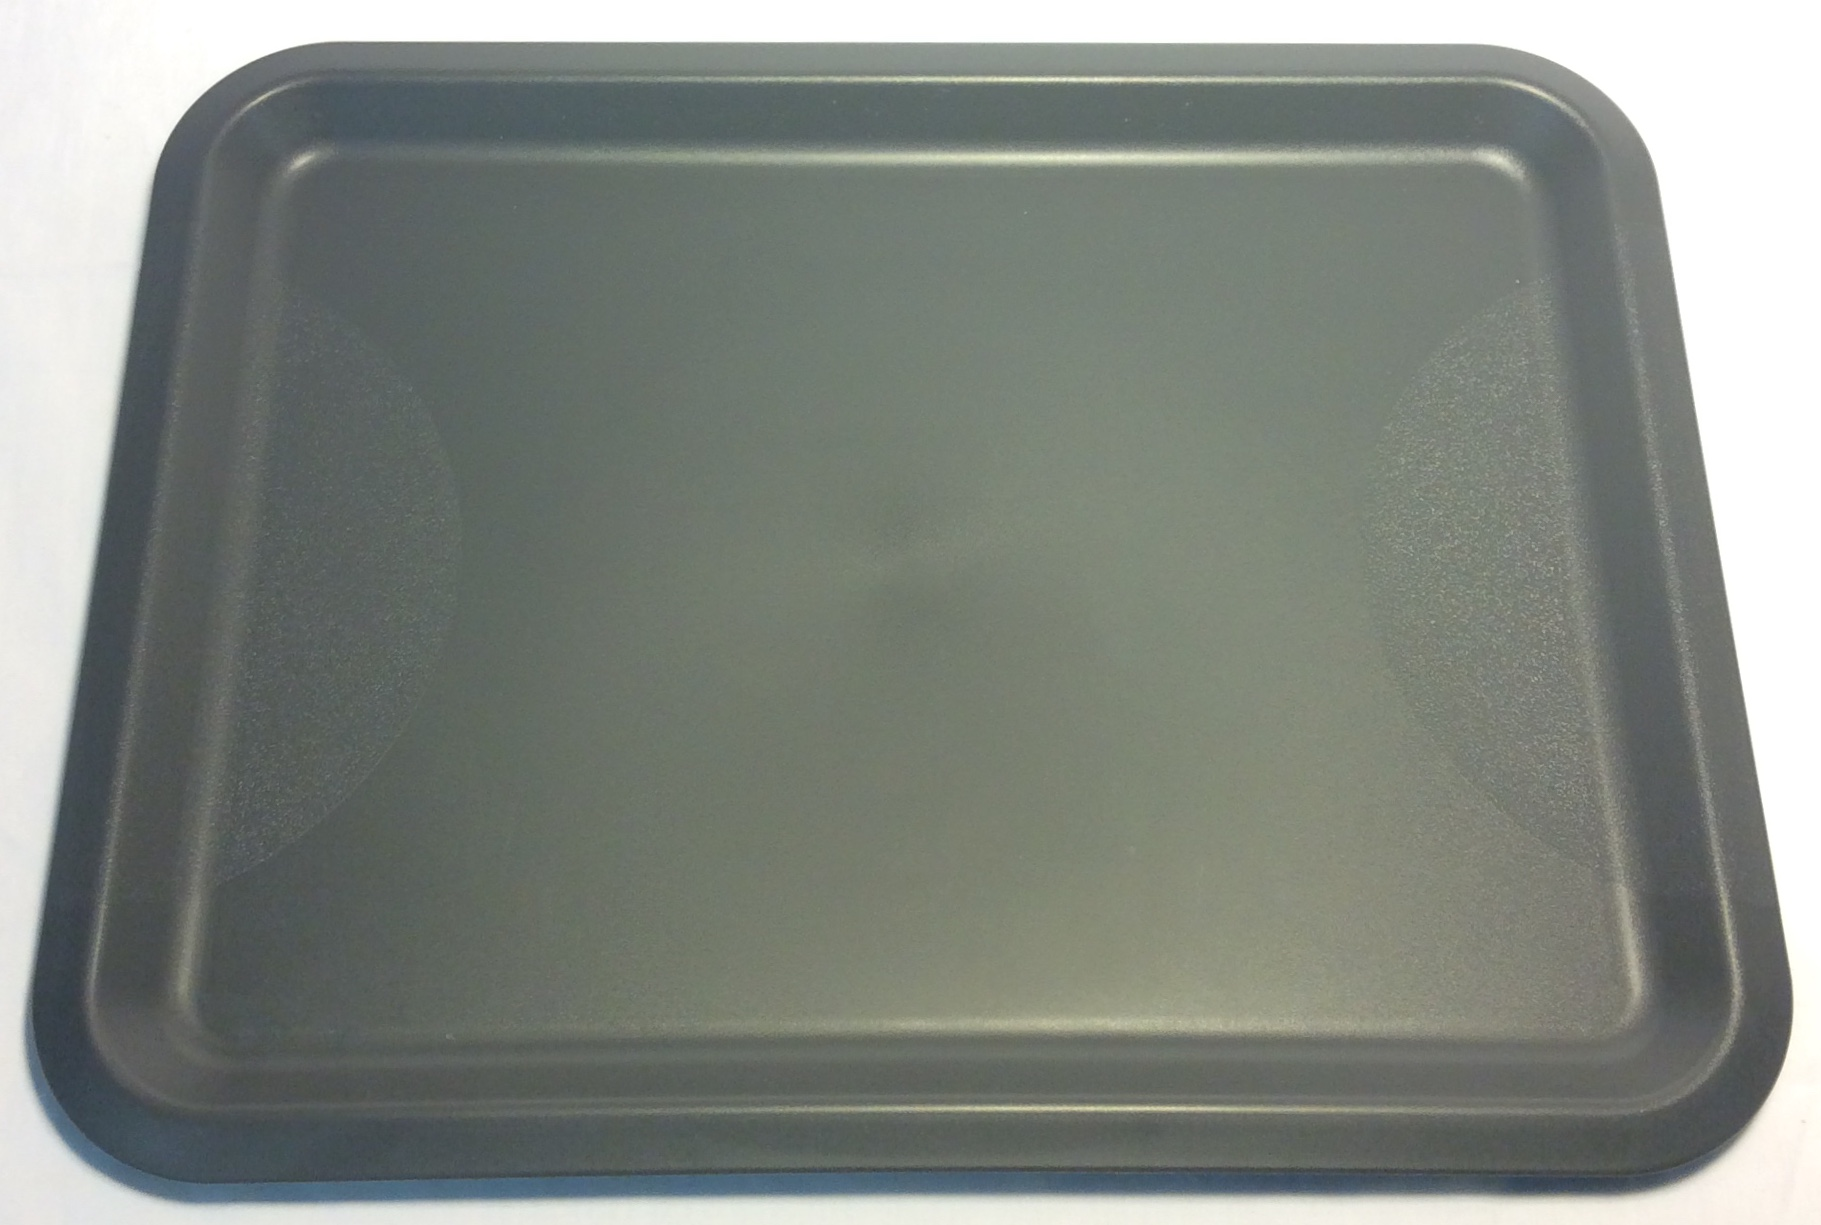 Ikea Grey plastic cafeteria trays